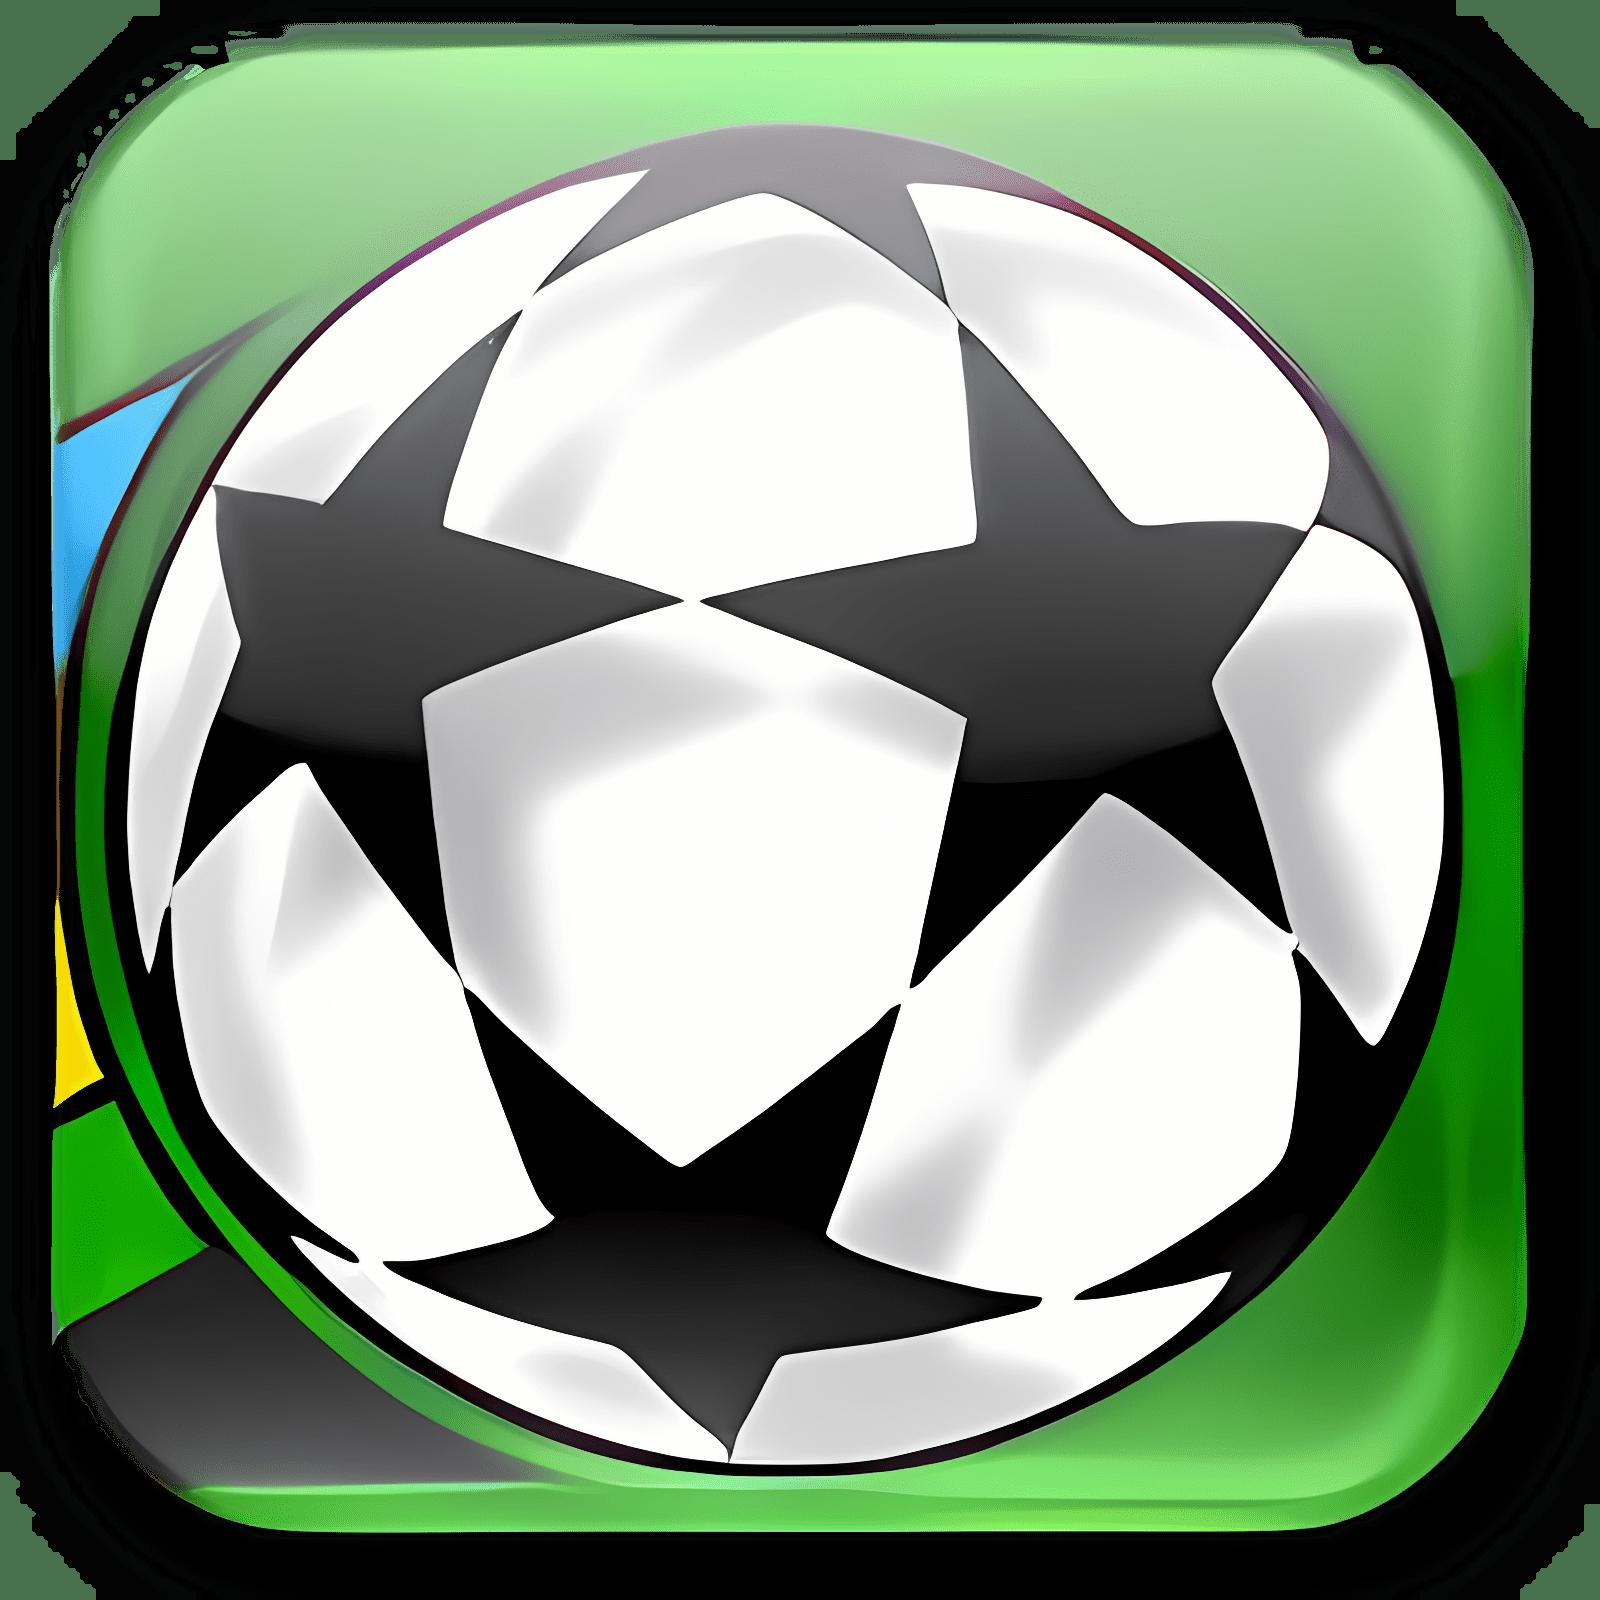 WildSnake Pinball: Soccer